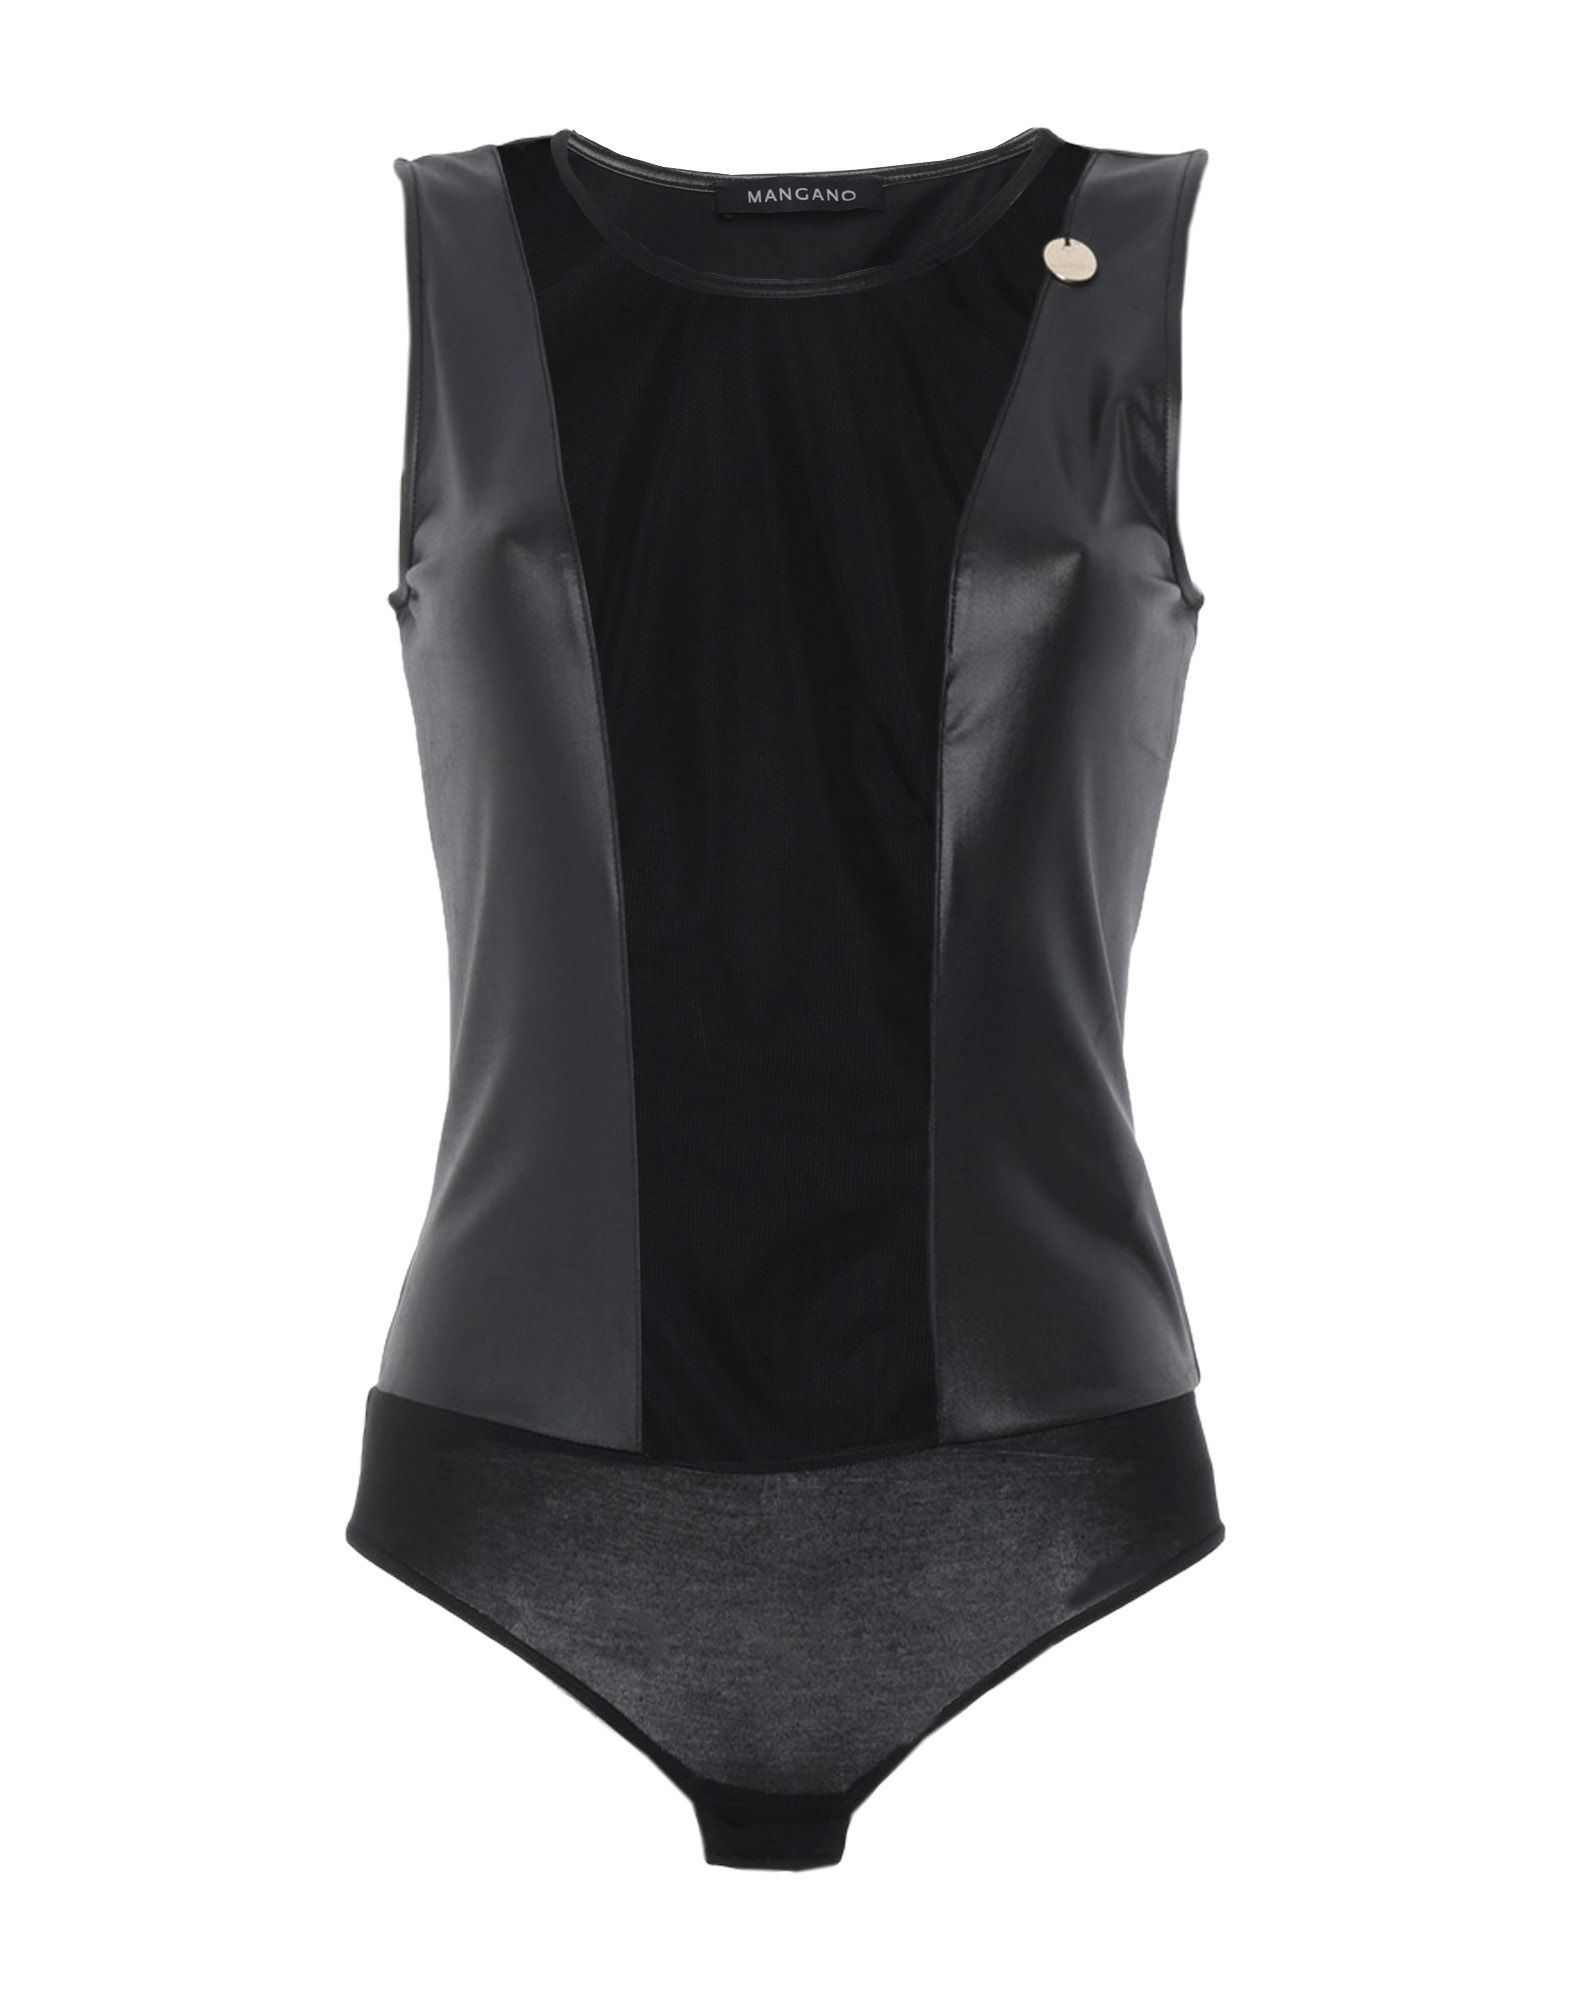 Mangano Jersey And Tulle Sleeveless Bodysuit